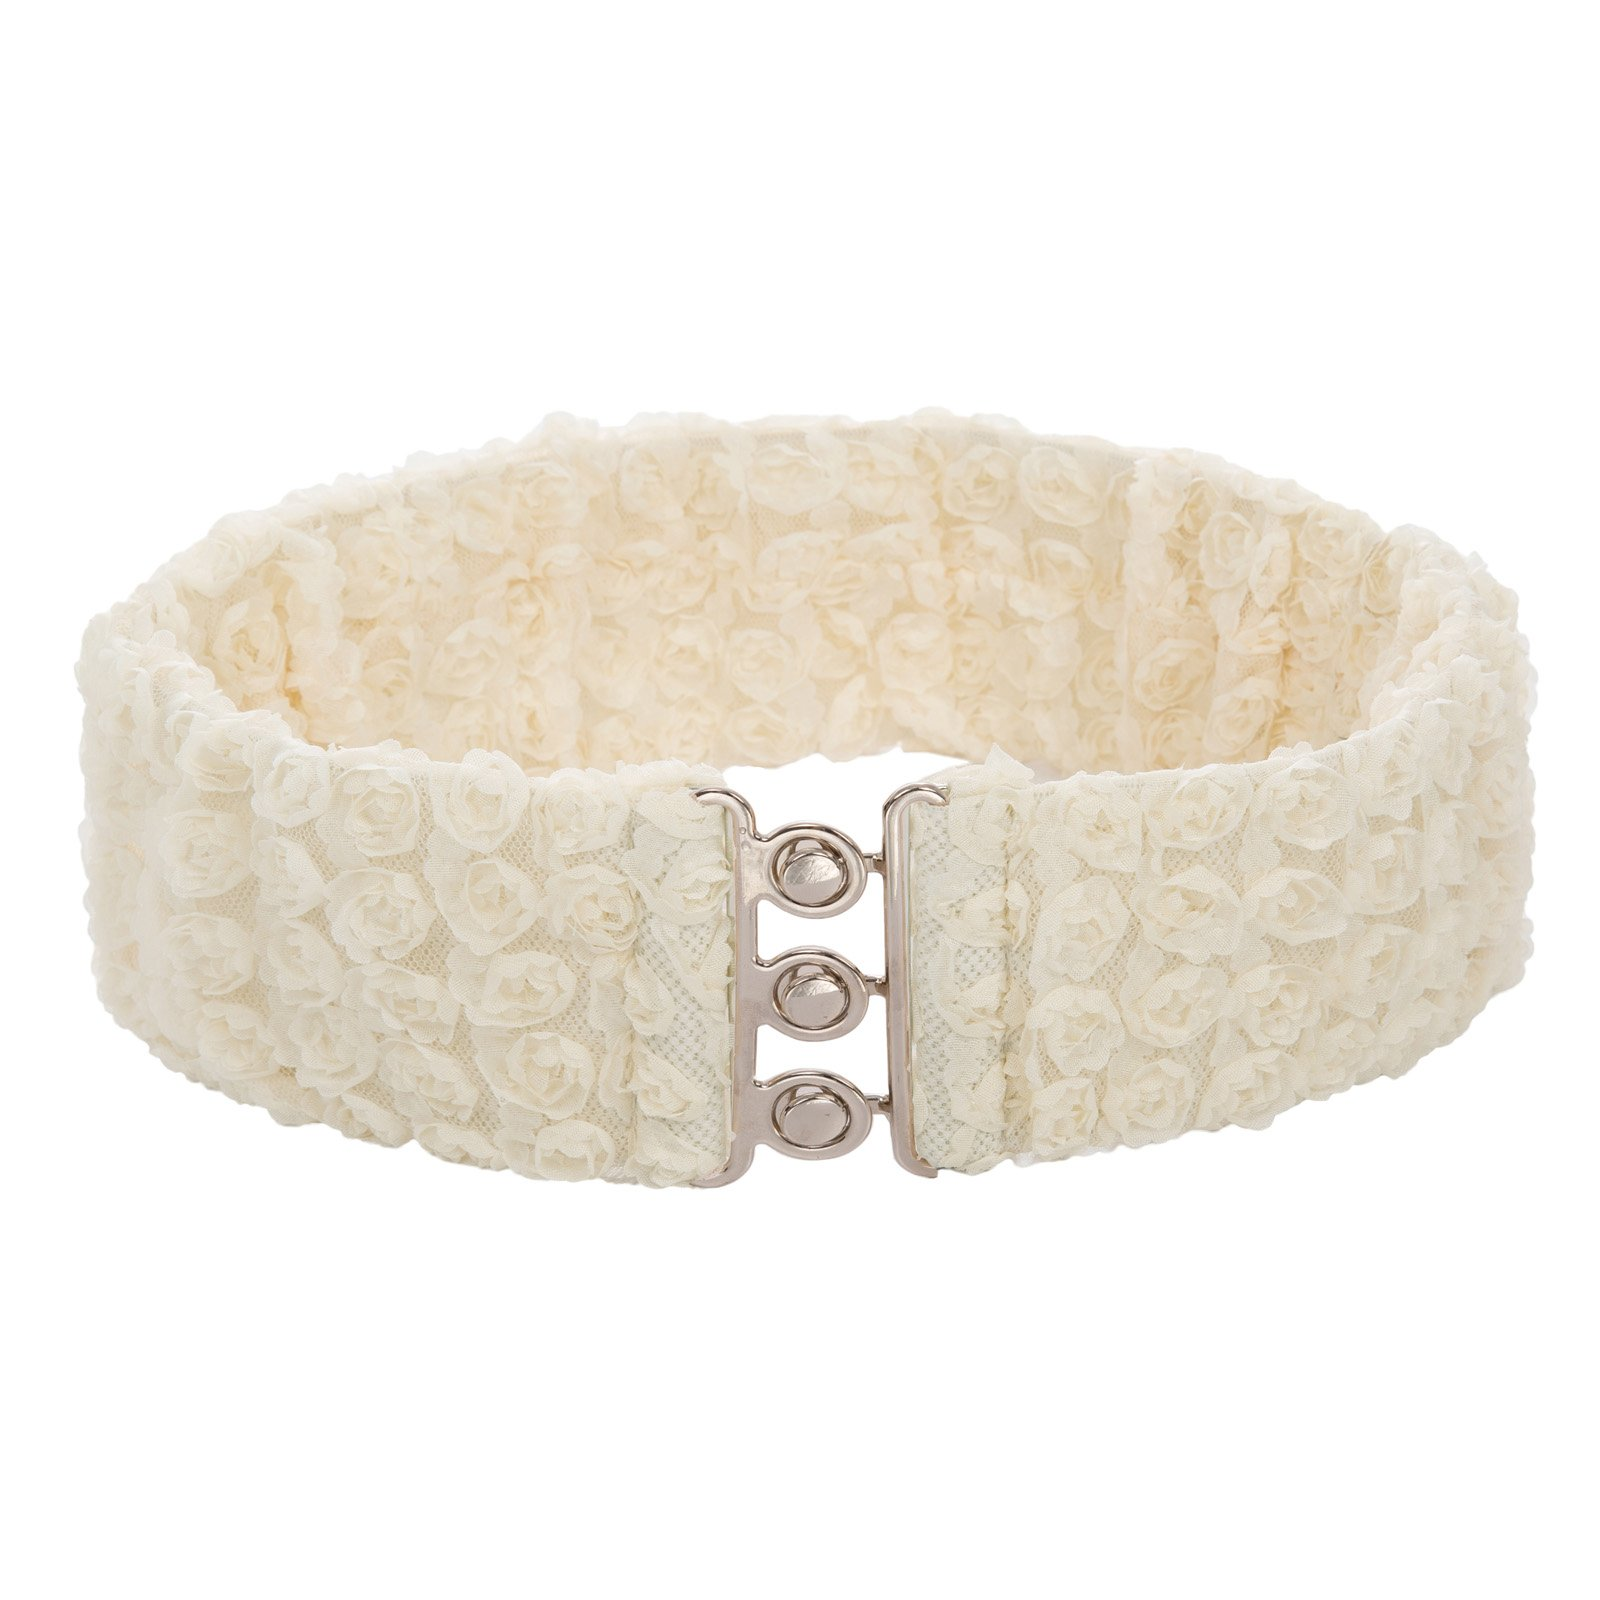 Women's Vintage Stretchy Wide Lace Elastic Cinch Belts Beige Size S CL758-1